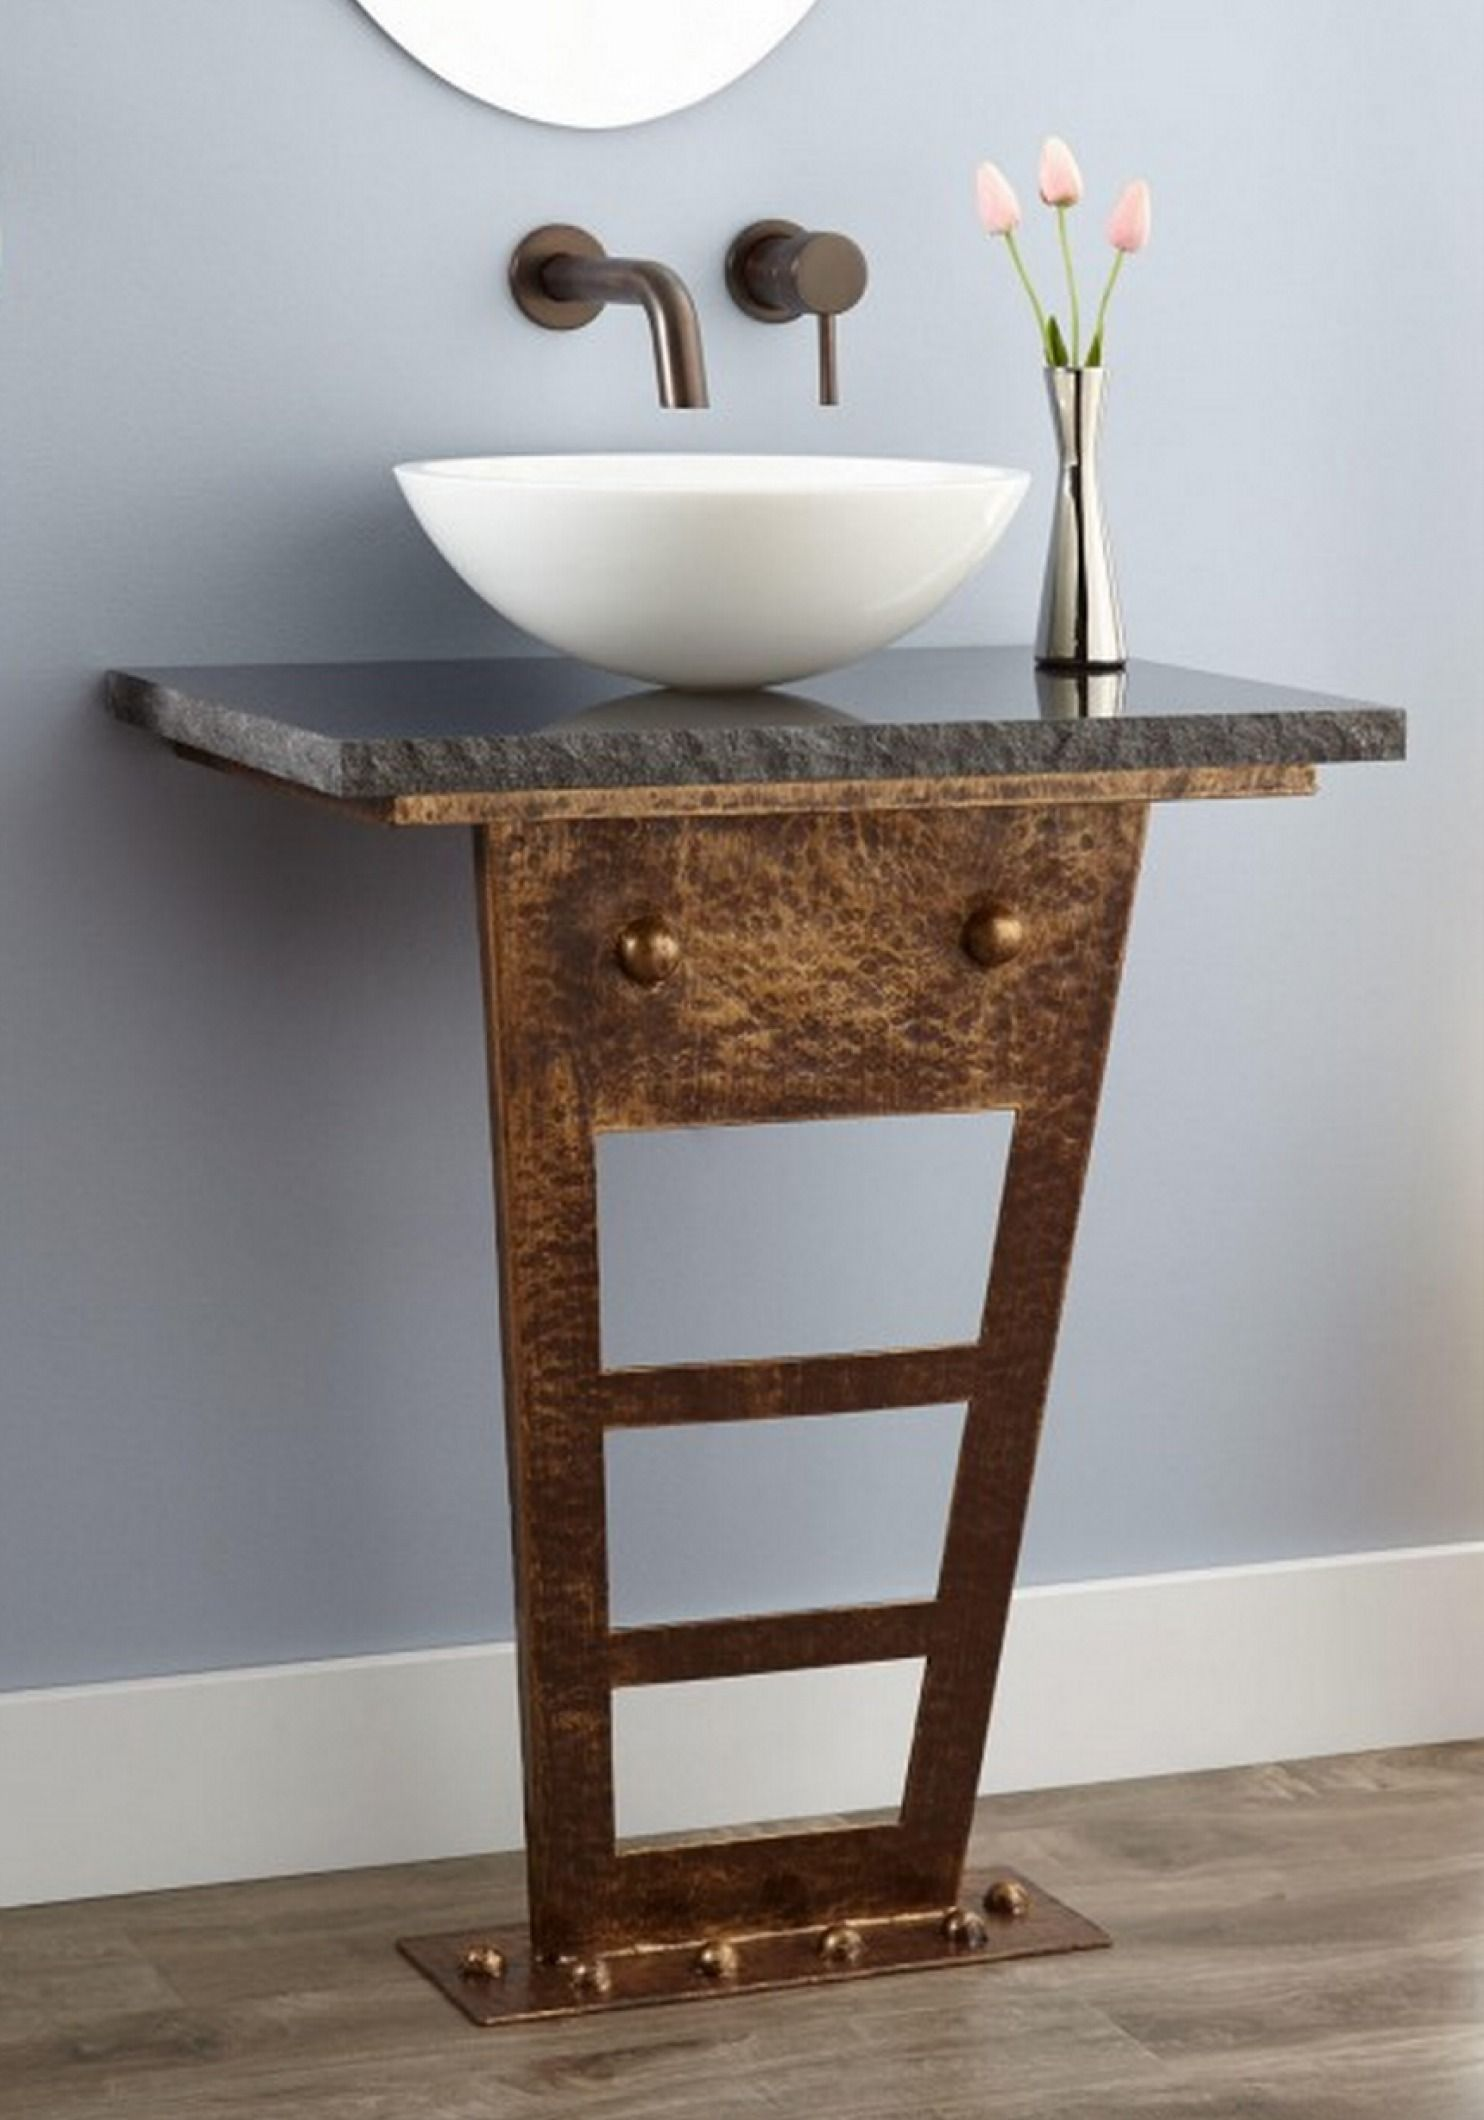 pedestal sink or vanity in small bathroom%0A Zhi WallMount Console Vanity for Vessel Sink